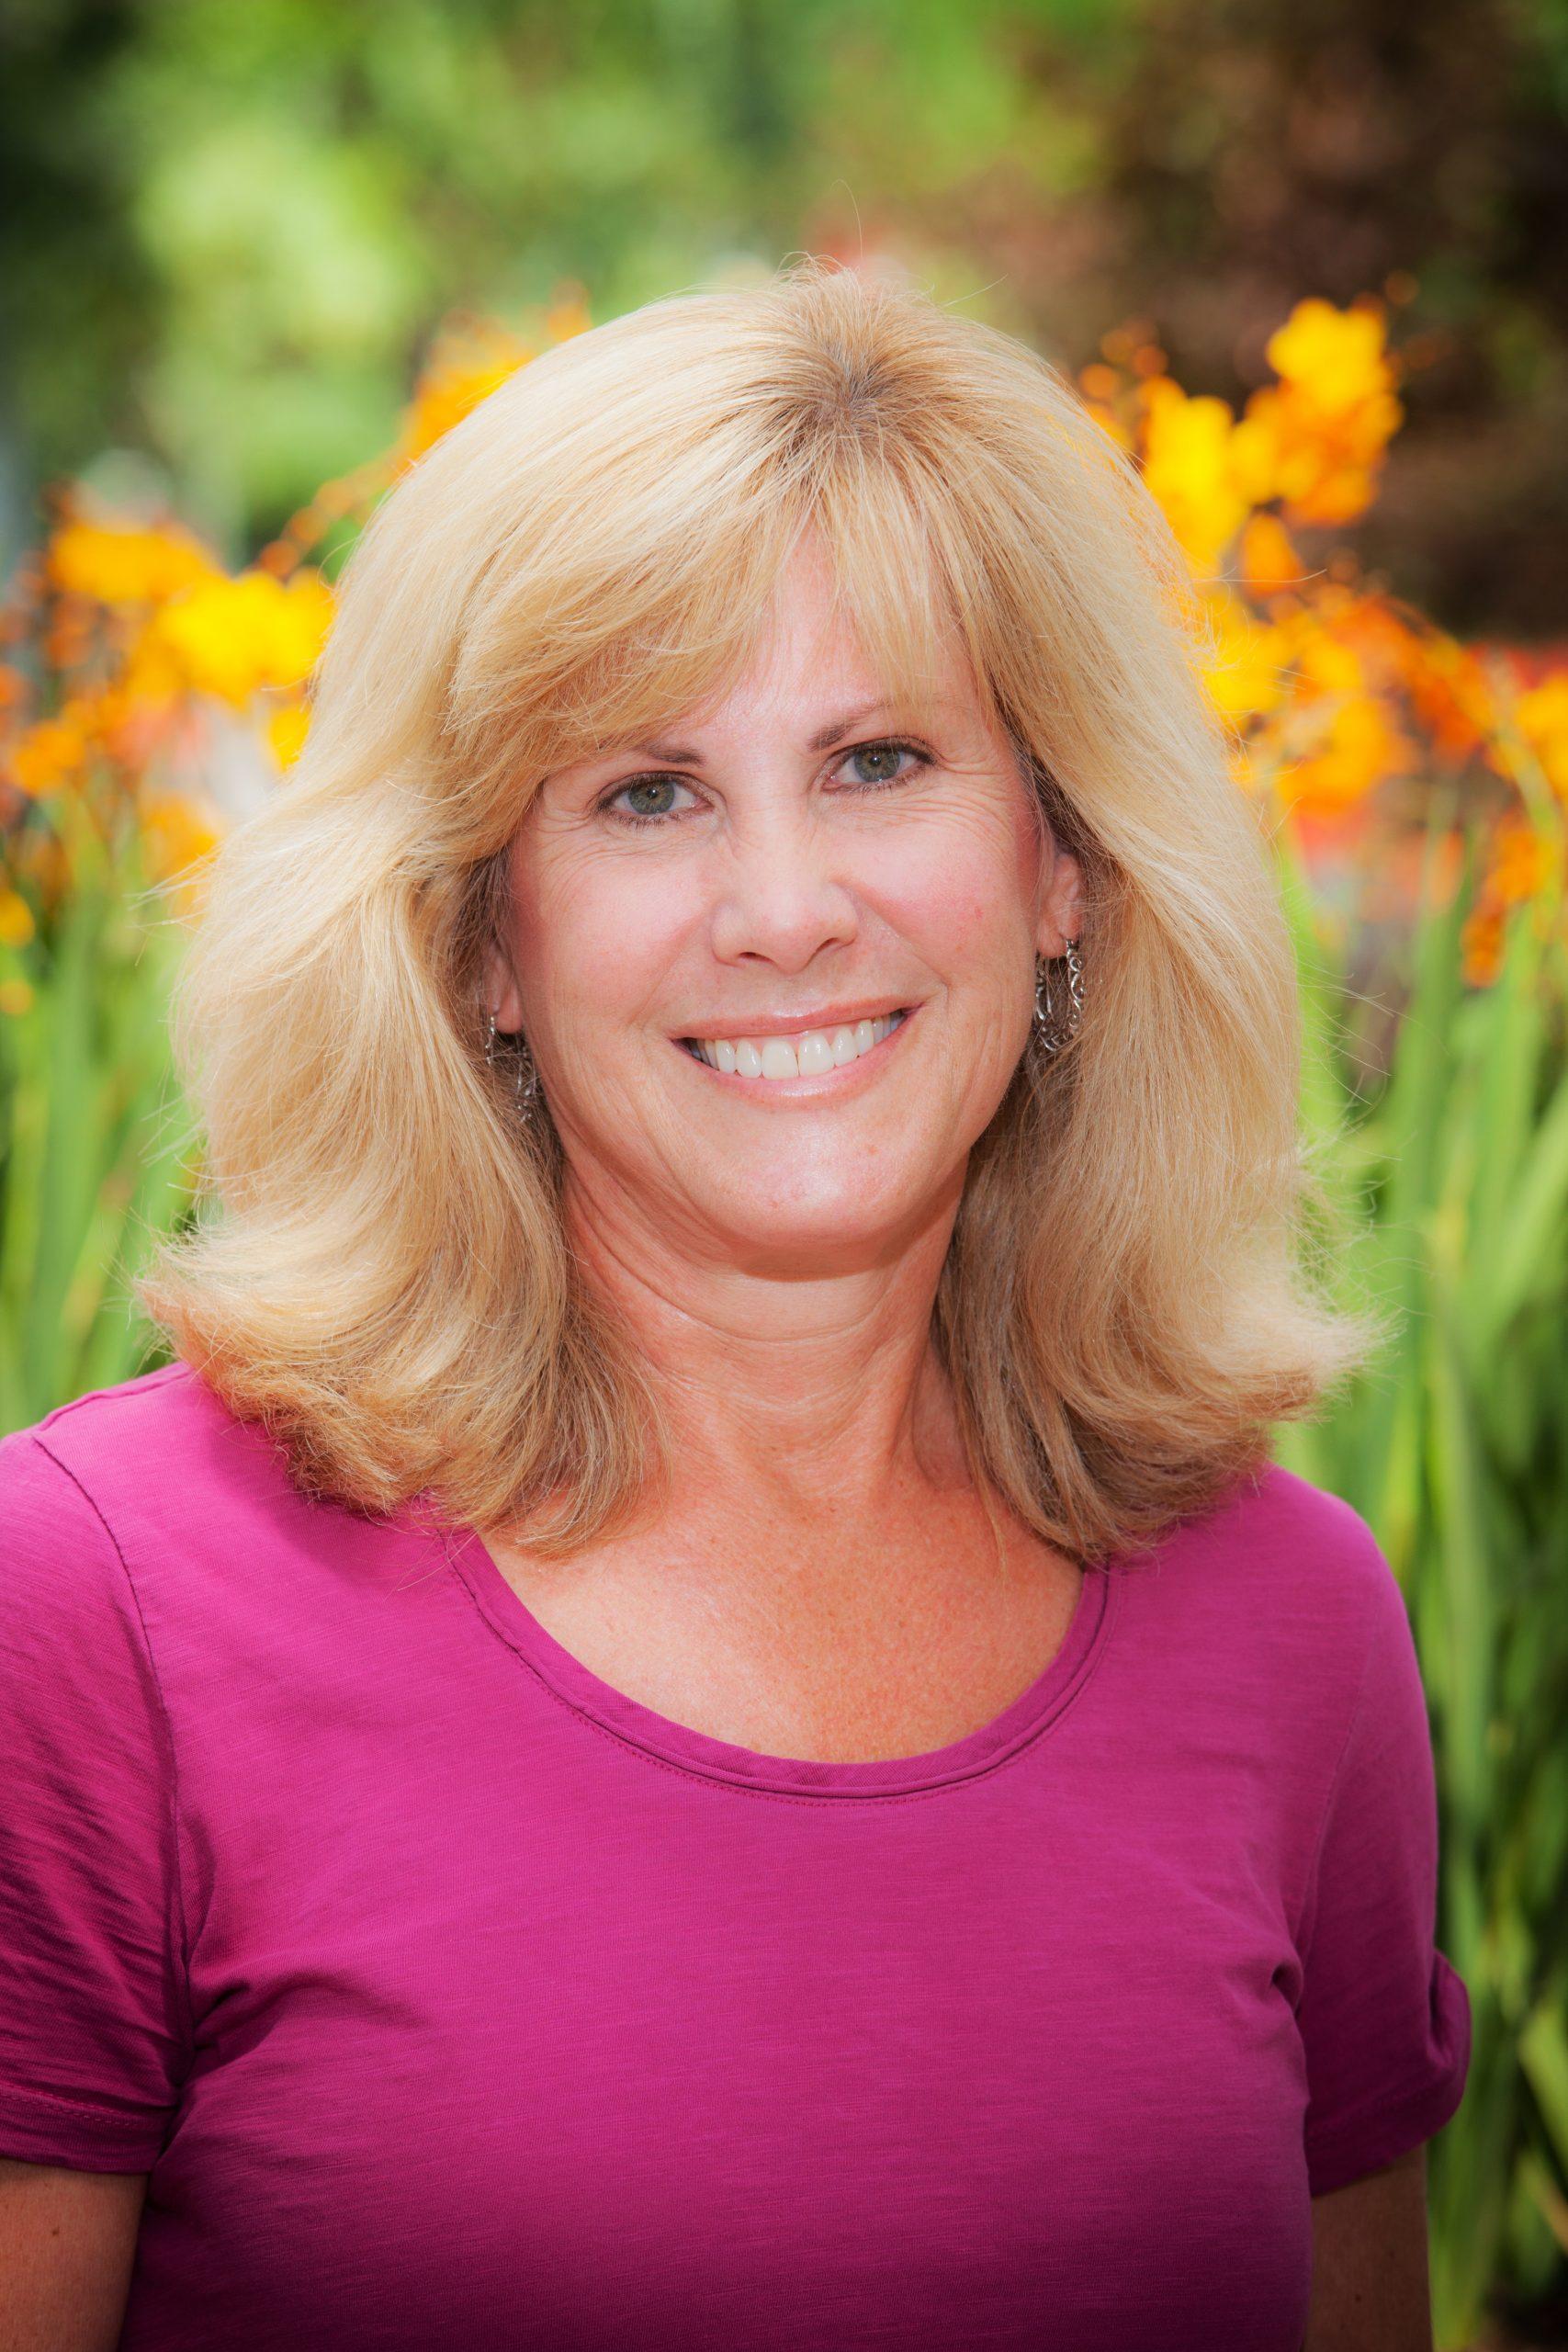 Lisa Watters-Lain, Arizona's garden gal